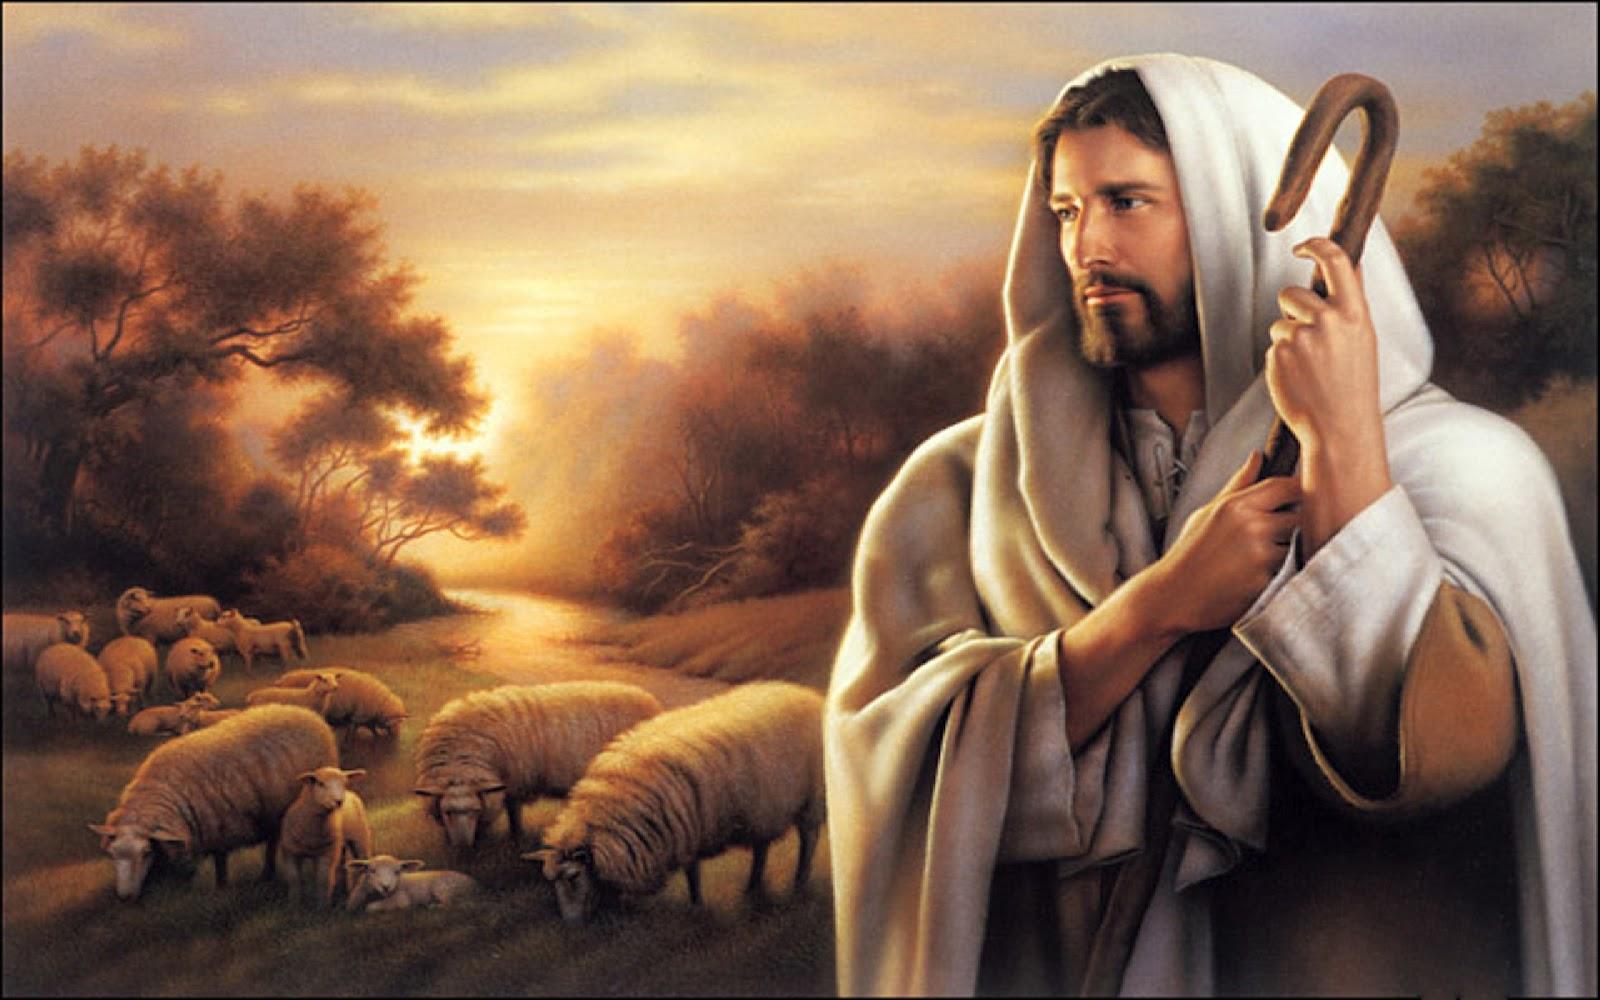 The Lost Sheep & Good Shepherd